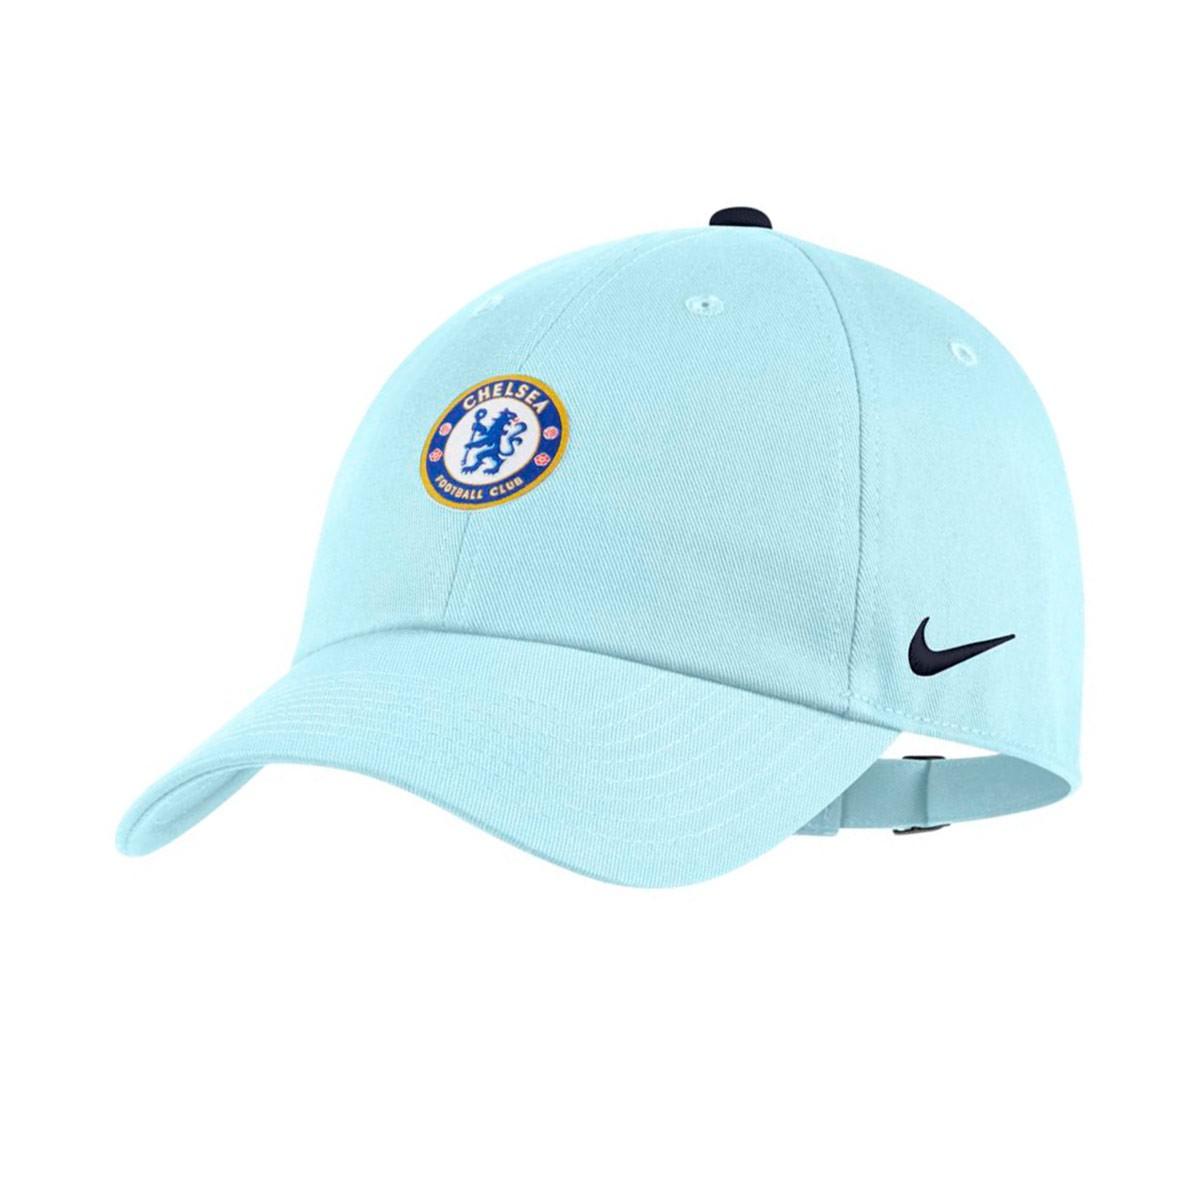 88685bf93cdfb8 Cap Nike Chelsea FC Heritage86 2018-2019 Glacier blue-Obsidian ...